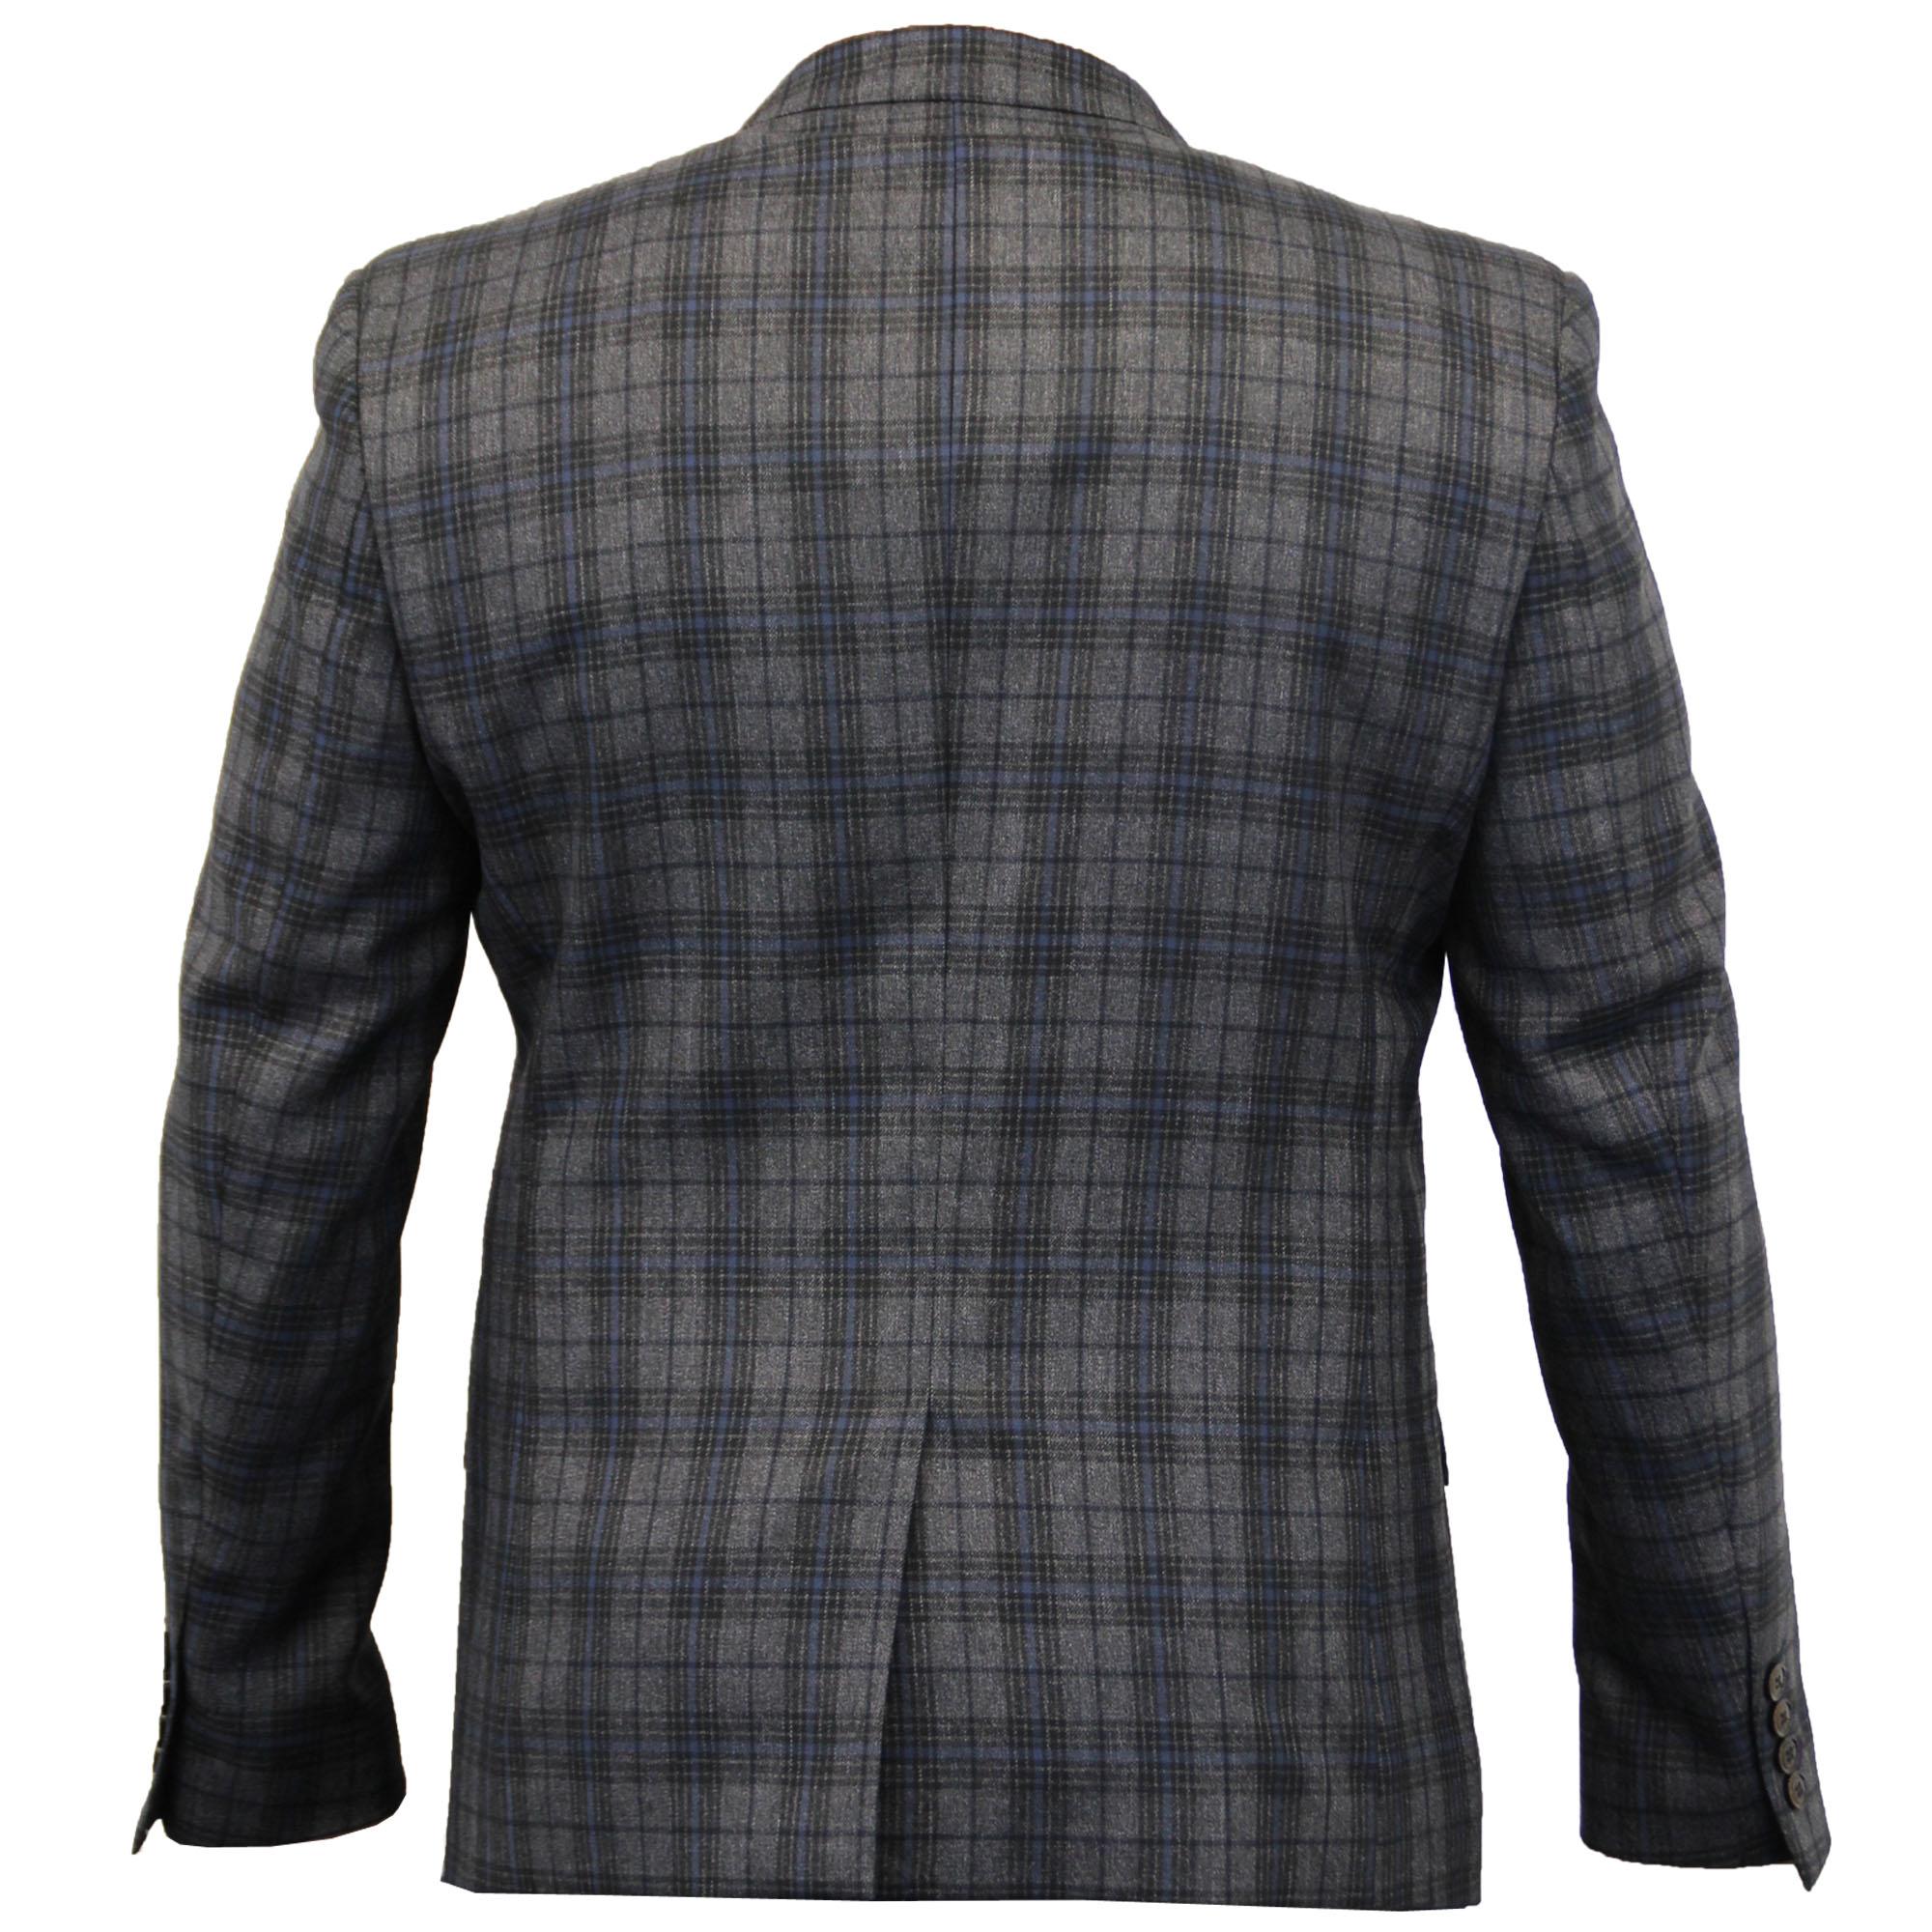 Blazers And Jackets: Mens Blazer Cavani Coat Dinner Suit Slim Fit Jacket Tartan